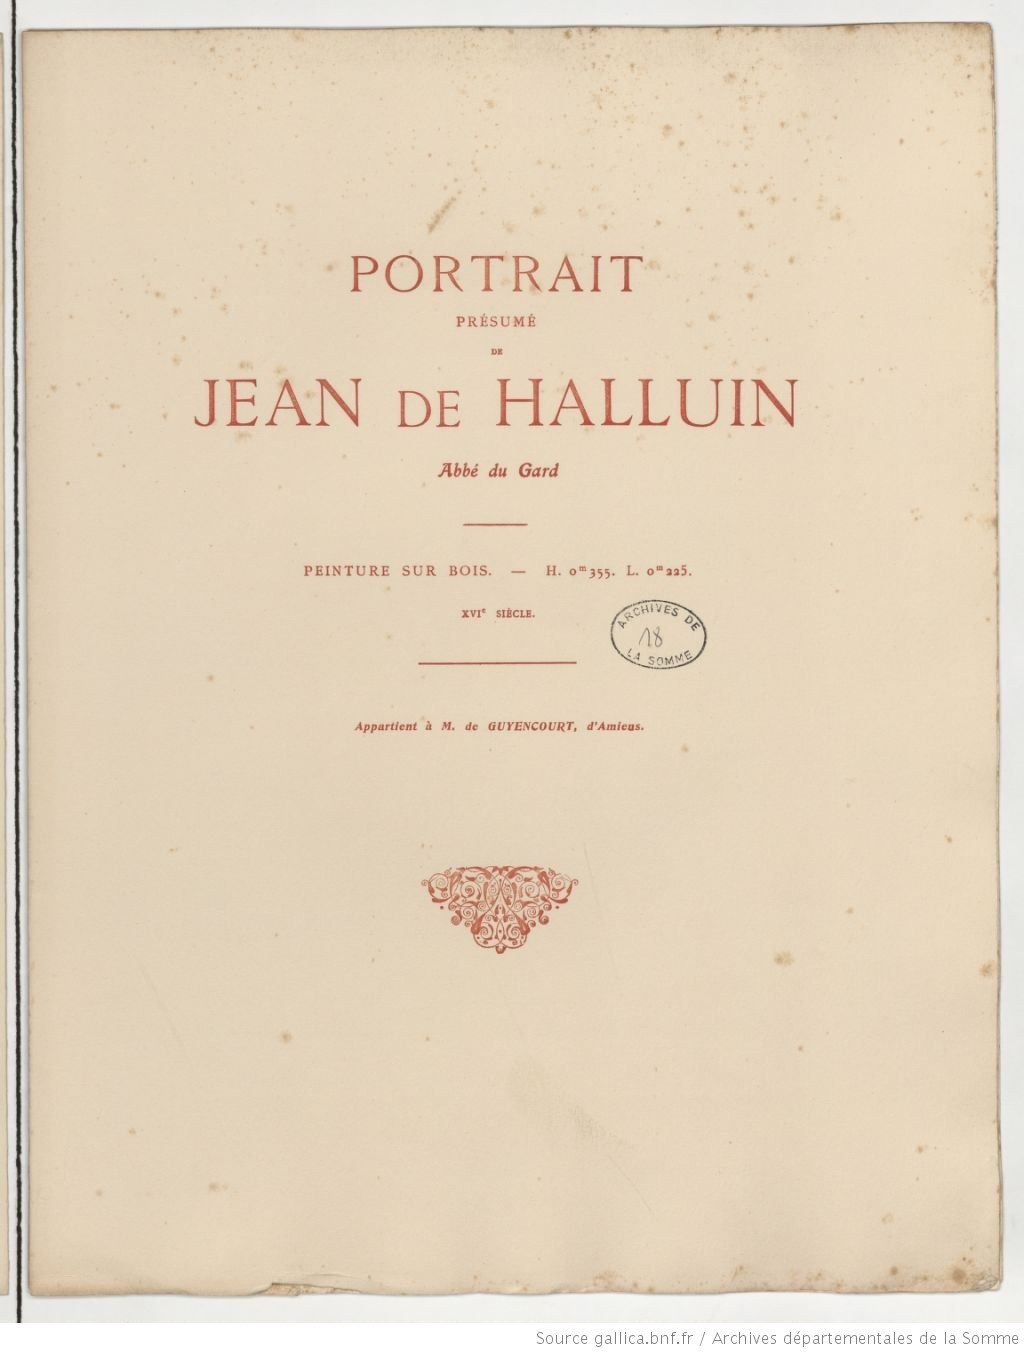 https://gallica.bnf.fr/ark:/12148/bpt6k97381005.highres.jpg